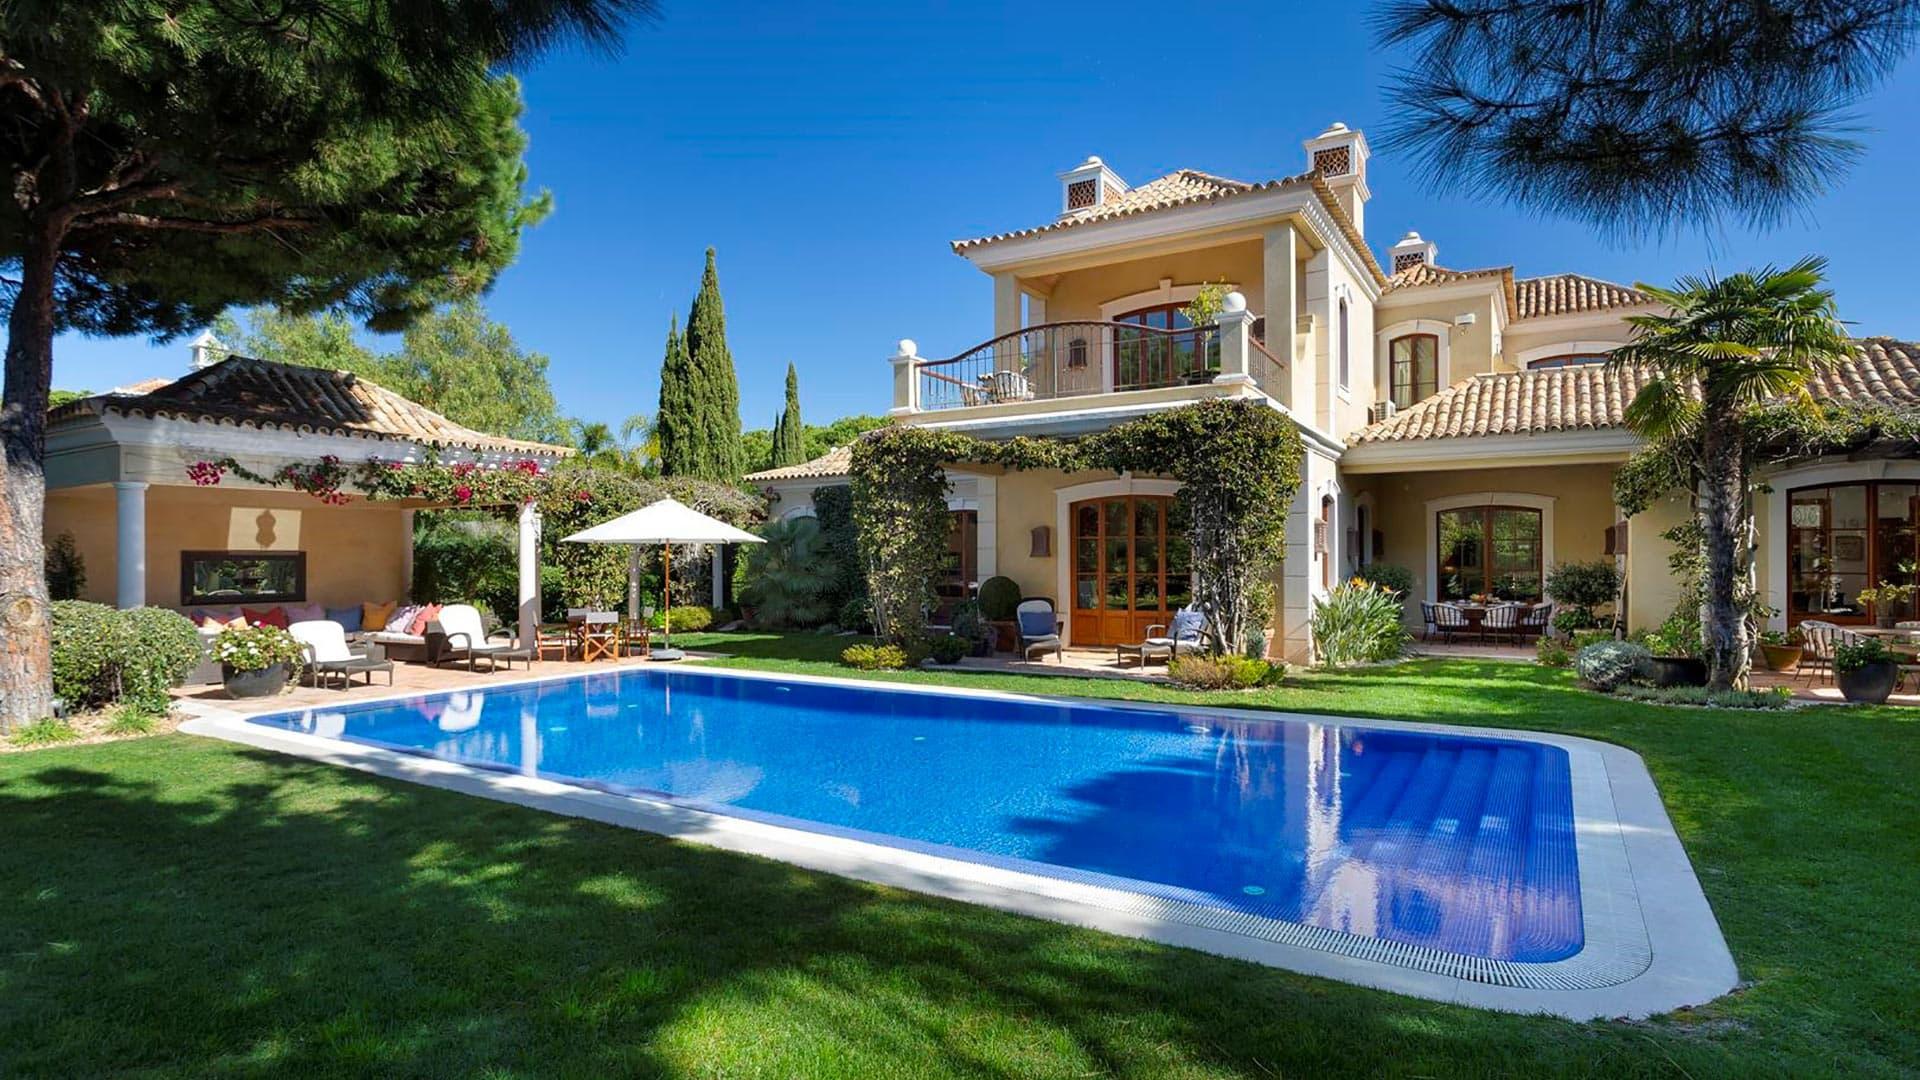 Location De Villa De Luxe Au Portugal | Villanovo encequiconcerne Location Maison Portugal Piscine